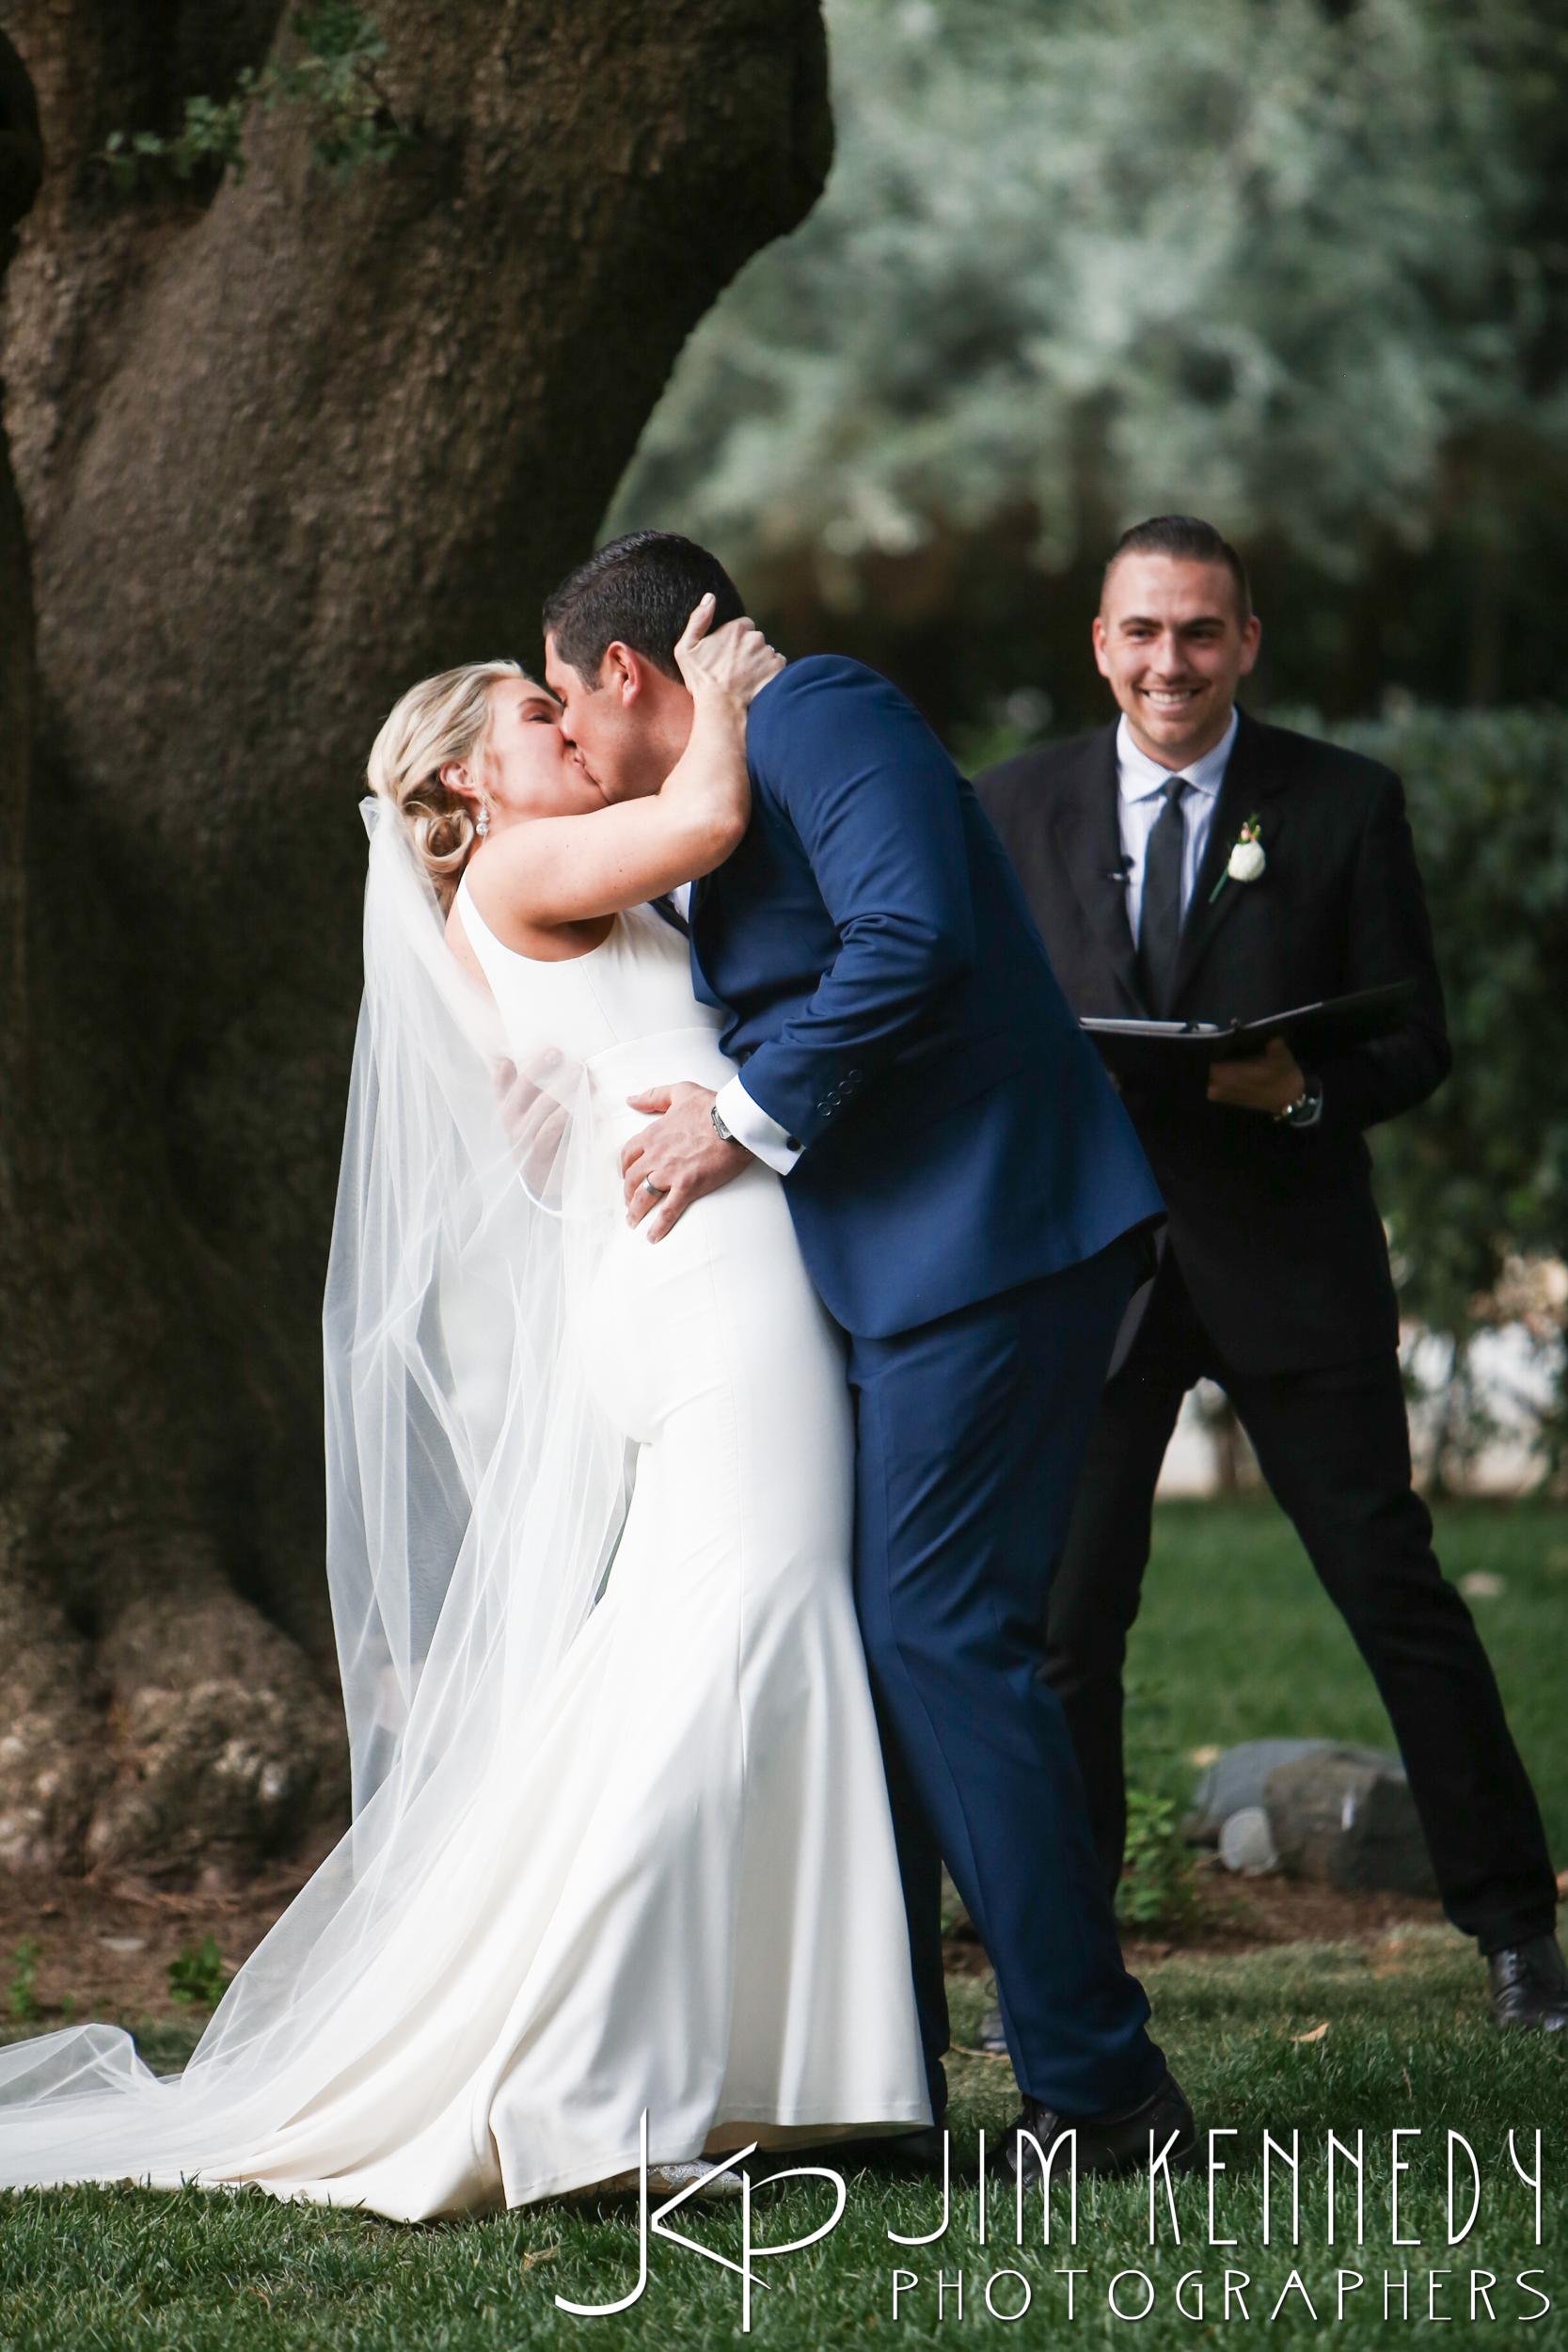 jim_kennedy_photographers_highland_springs_wedding_caitlyn_0120.jpg